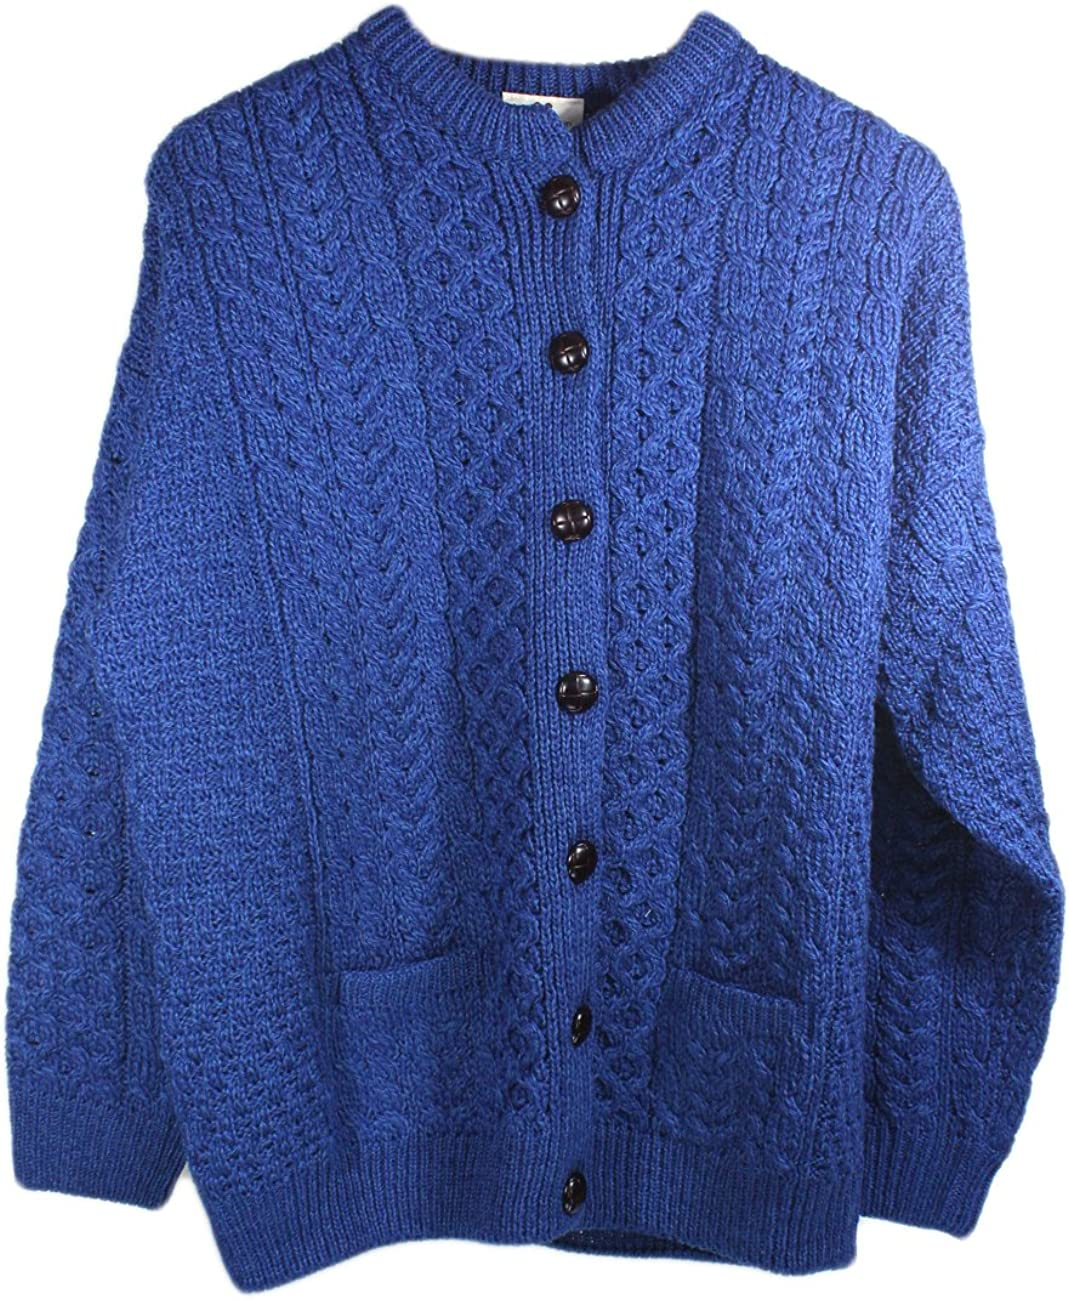 Irish Aran Sweater for Women 100% Merino Wool Lumber Cardigan Made in Ireland